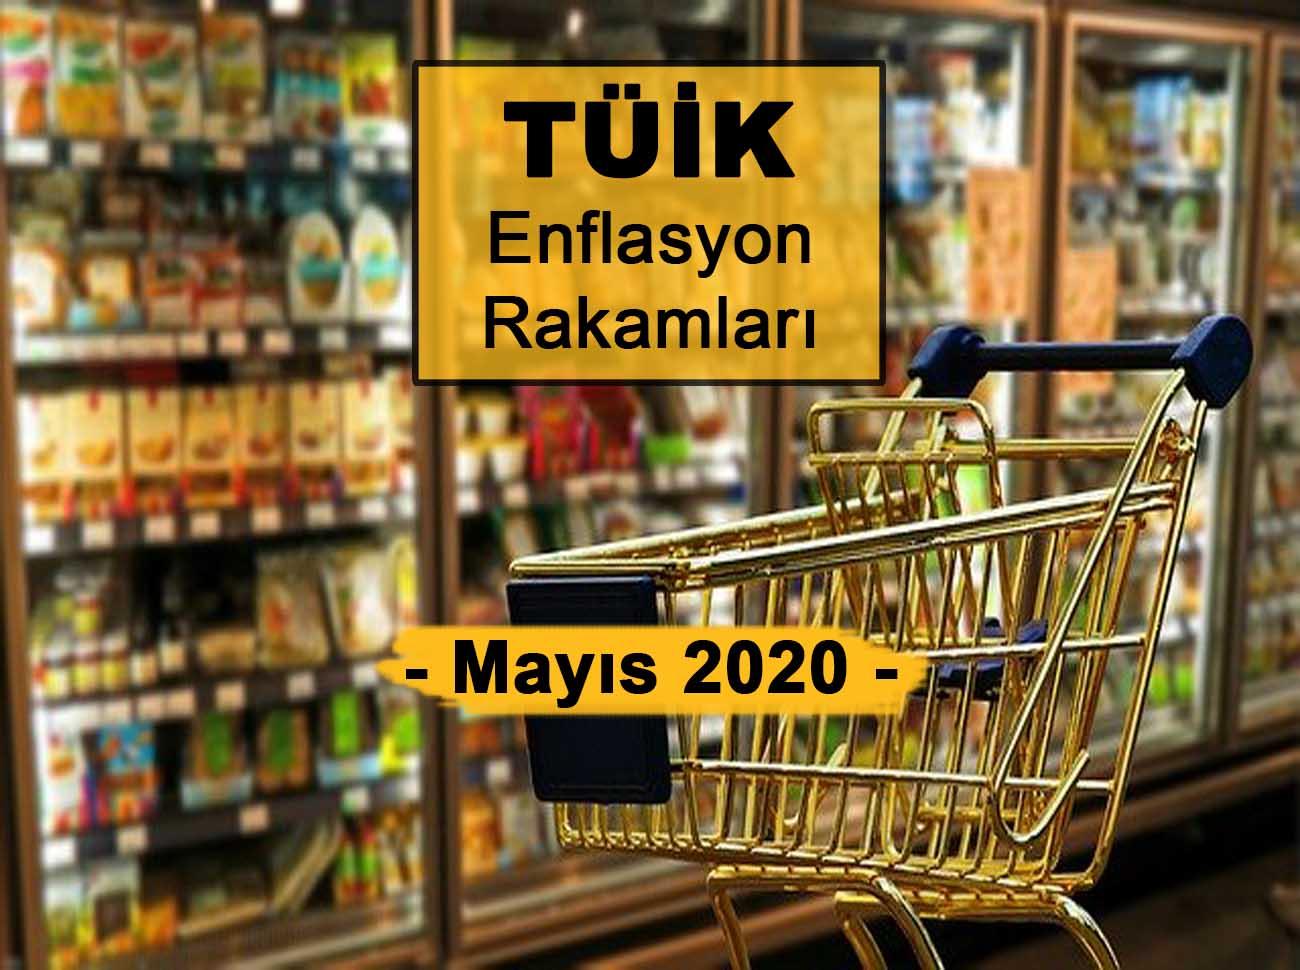 Enflasyon Rakamları (Mayıs 2020)